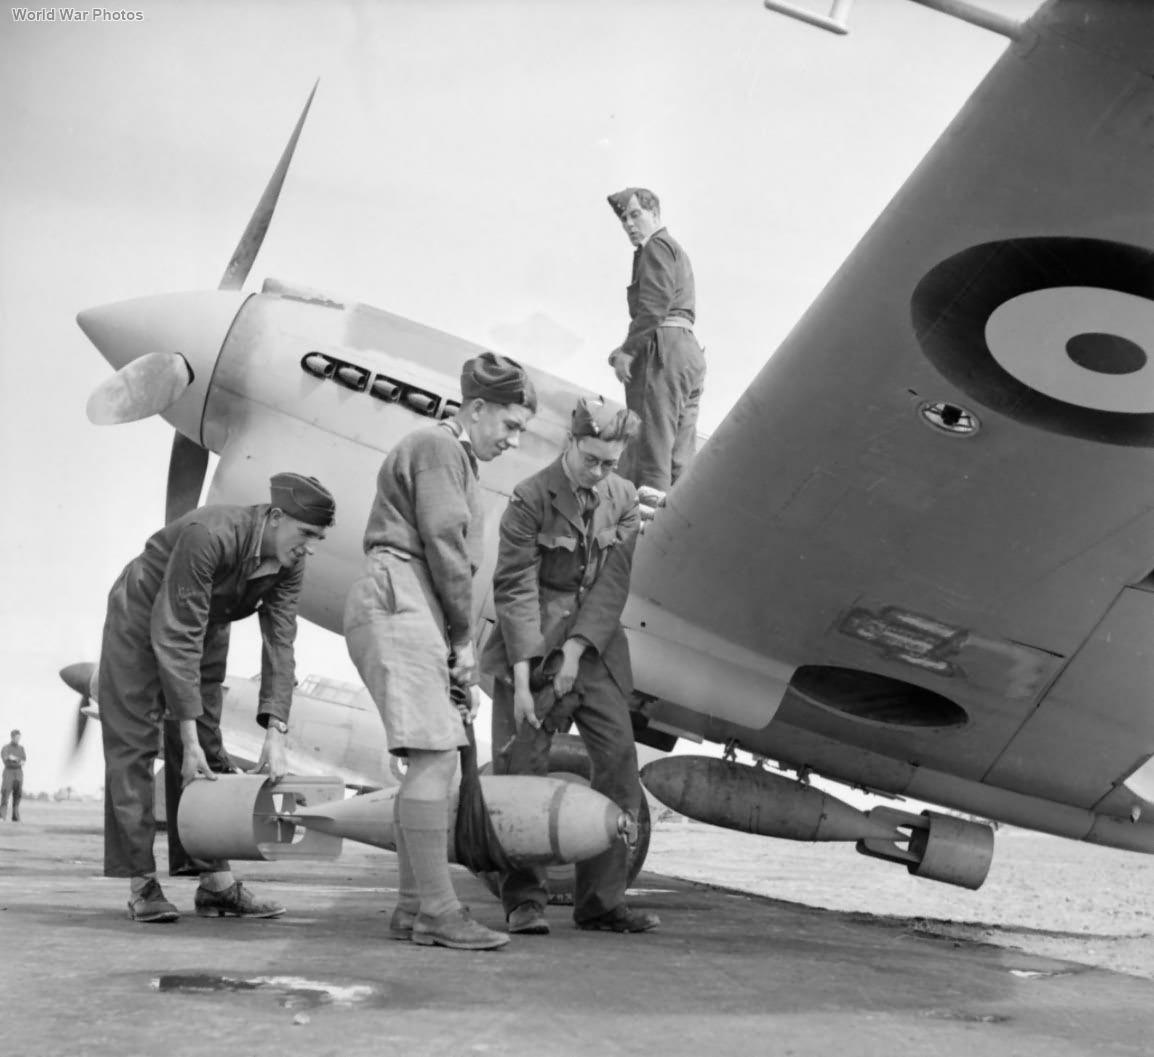 Kittyhawk Mk I with bombs Egypt